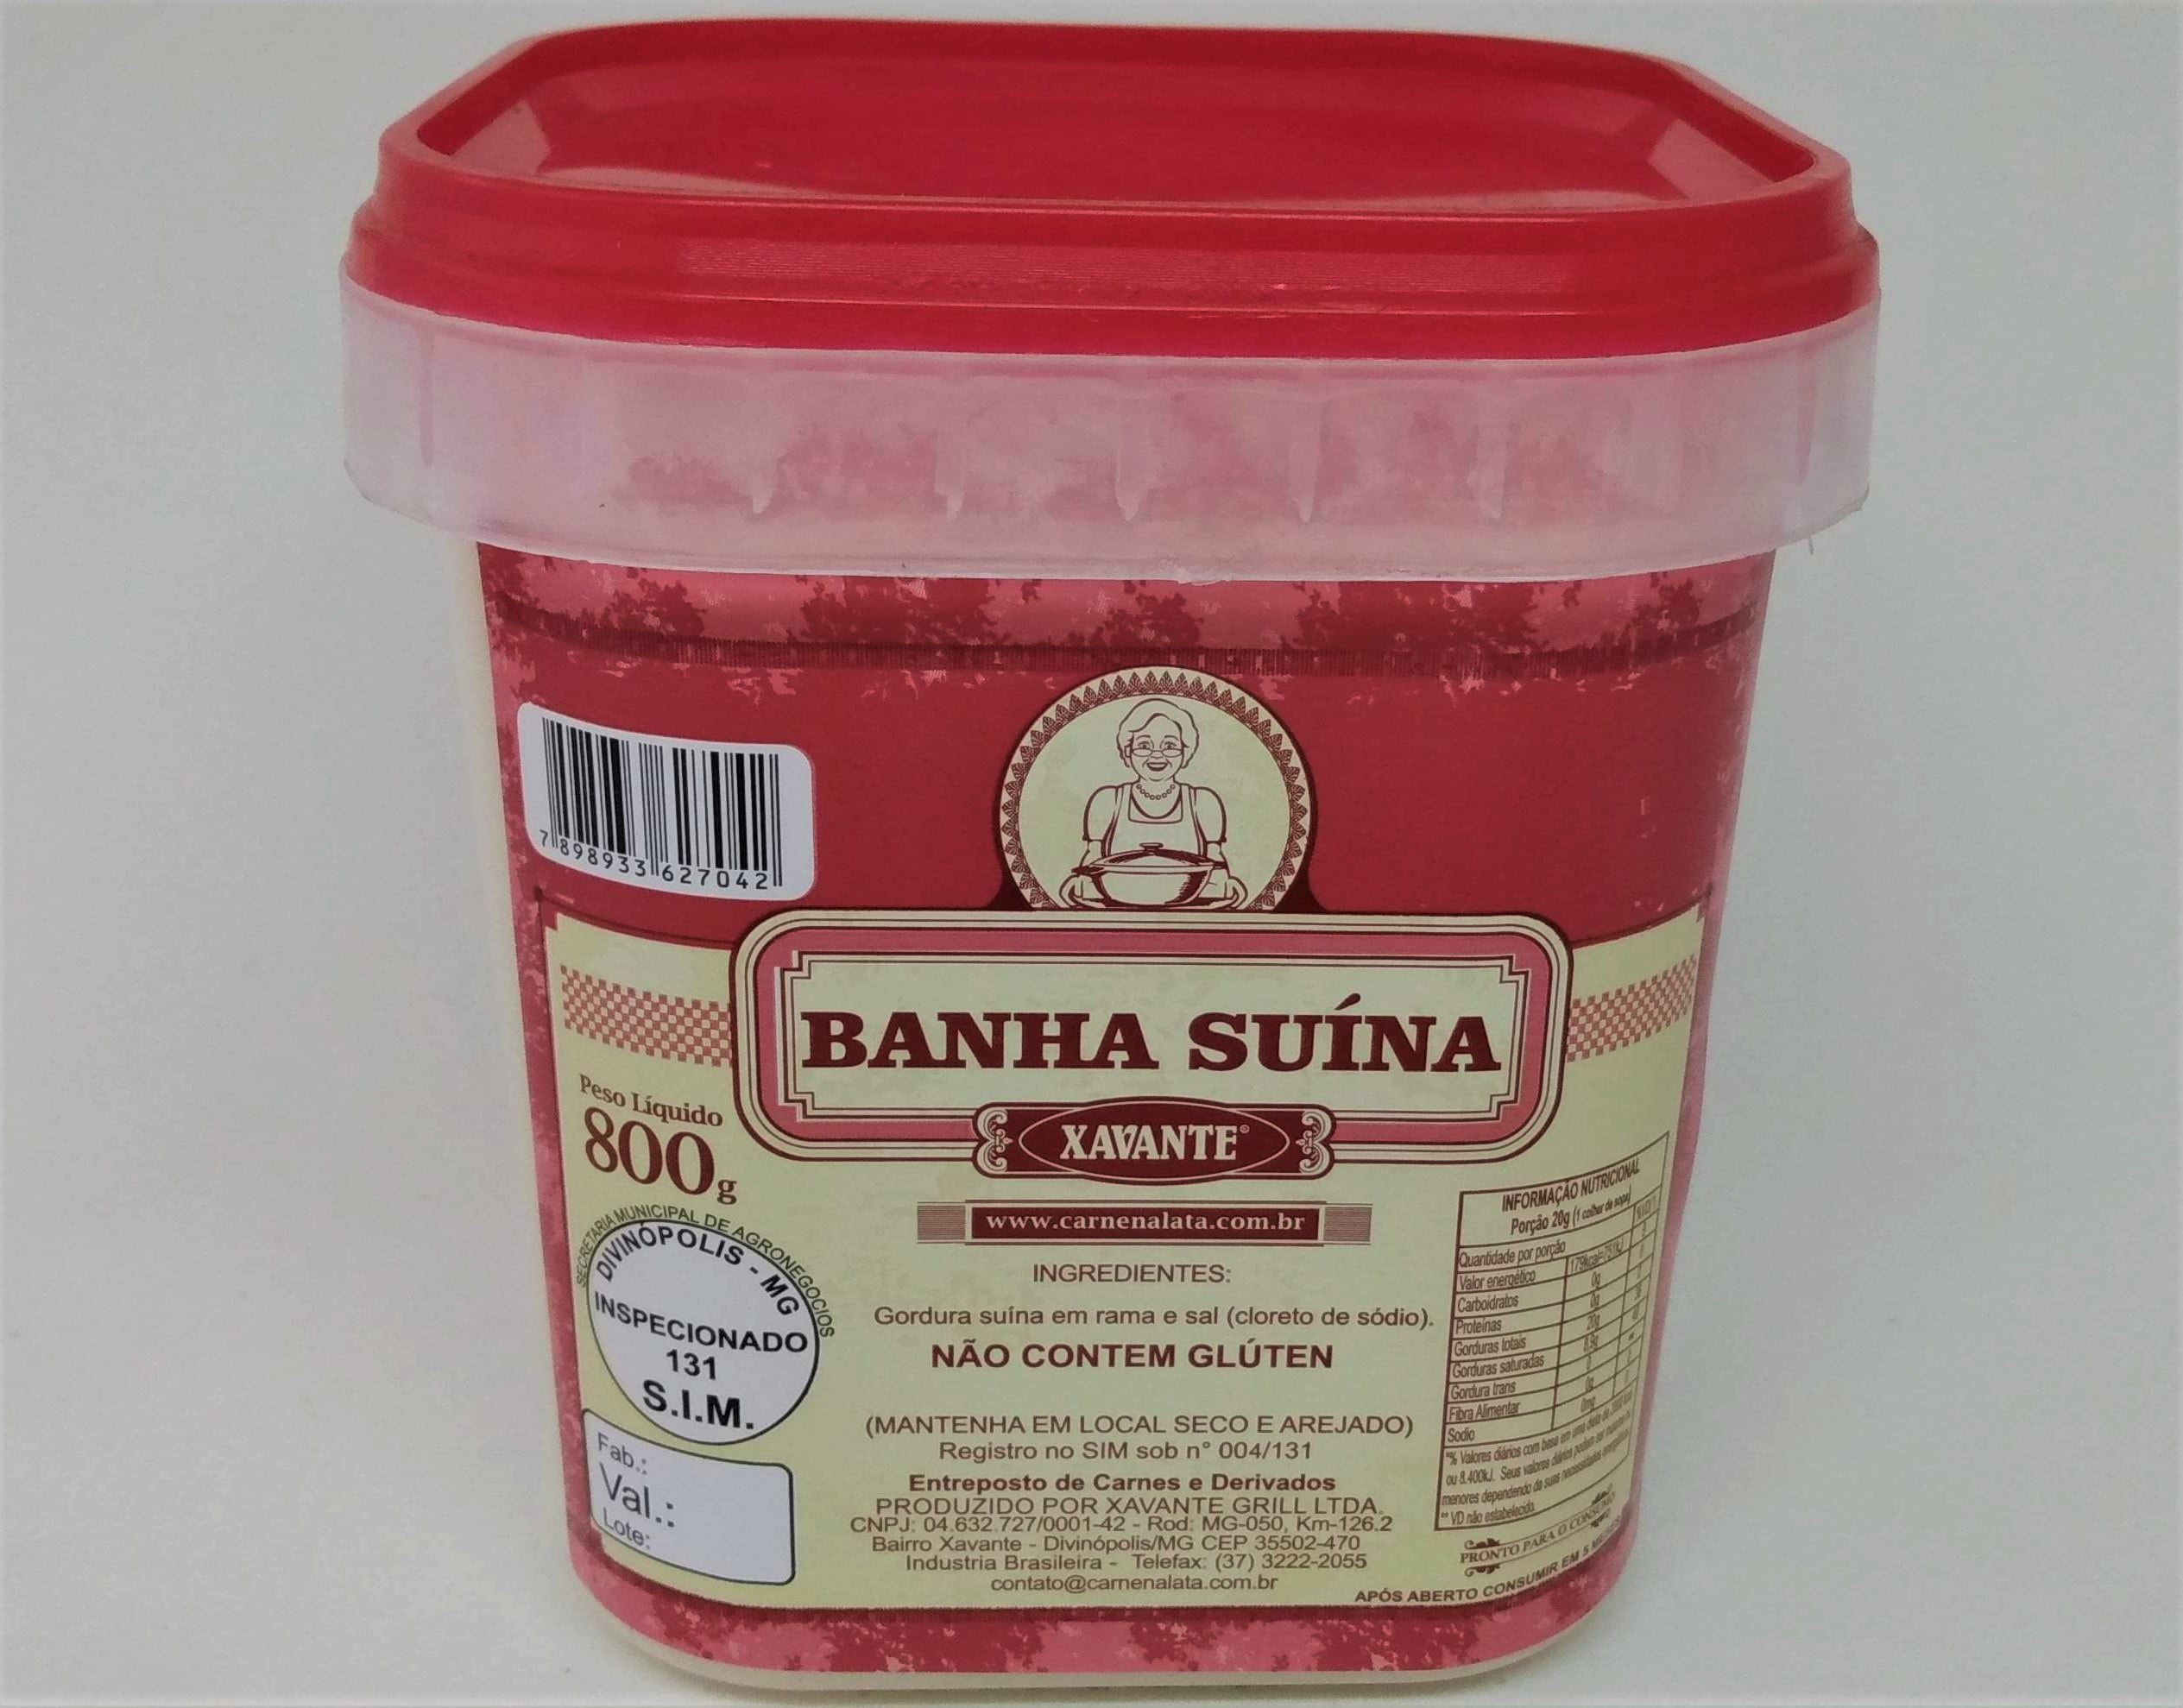 carne na lata, banha suina, carne na gordura, carne suina, pernil, xavante, paçoca, farinha